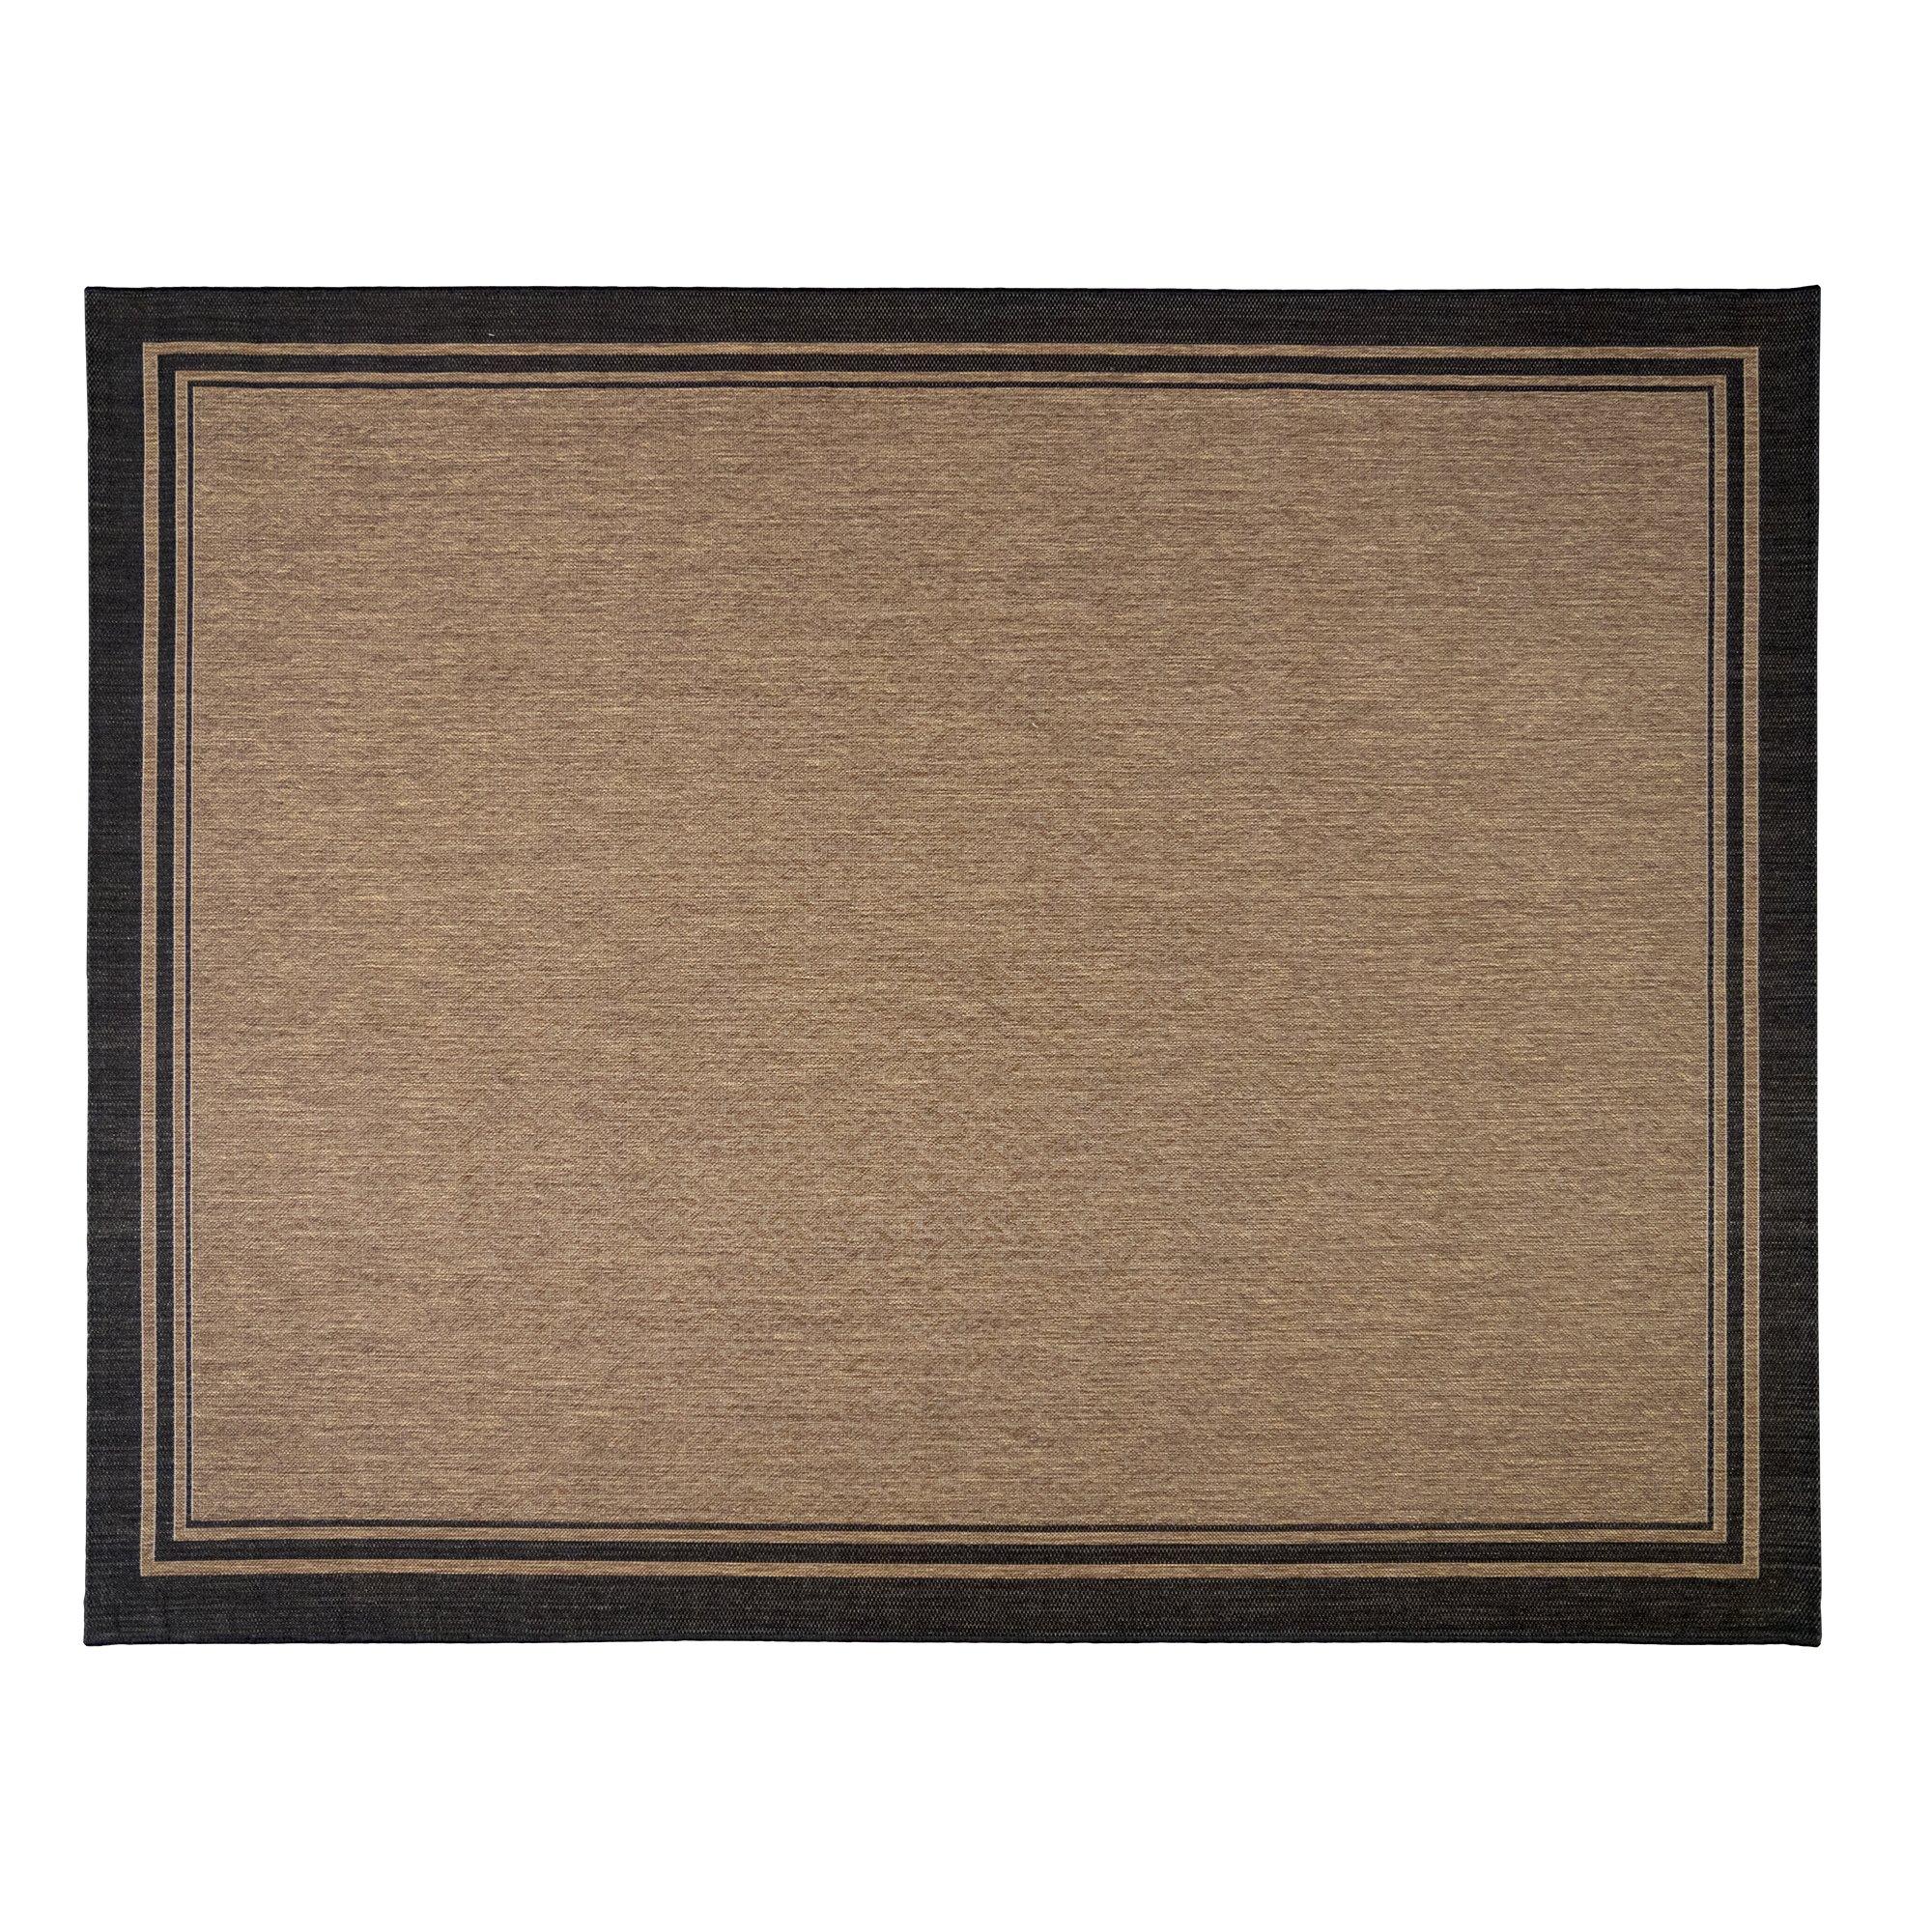 Nautical Patio Rug: Gertmenian 21358 Nautical Tropical Carpet Outdoor Patio